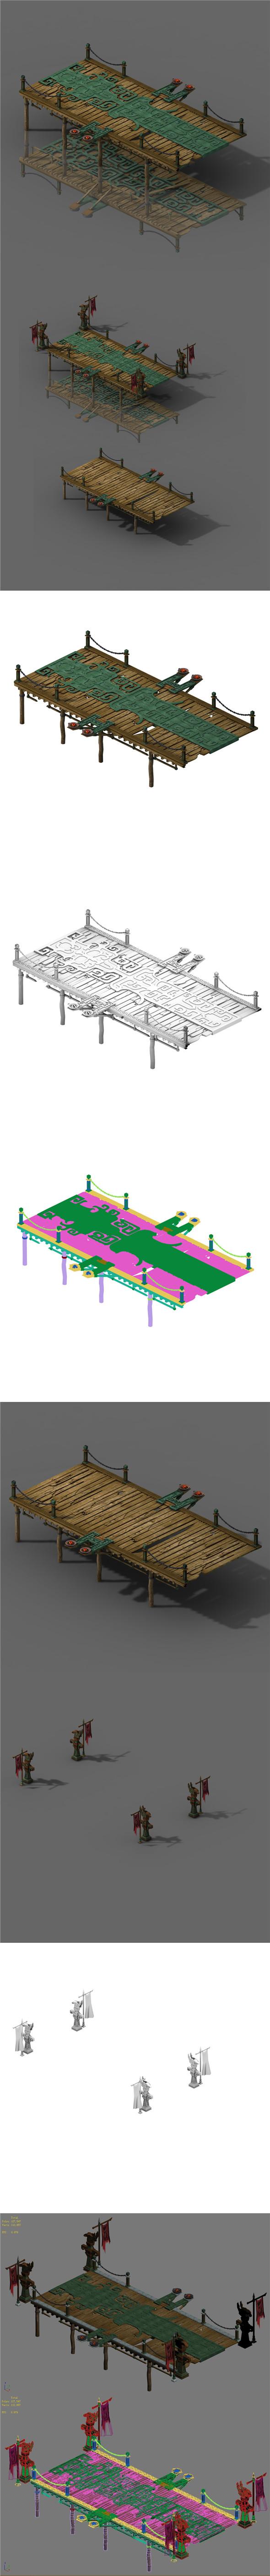 Building - Woodbridge 08 - 3DOcean Item for Sale